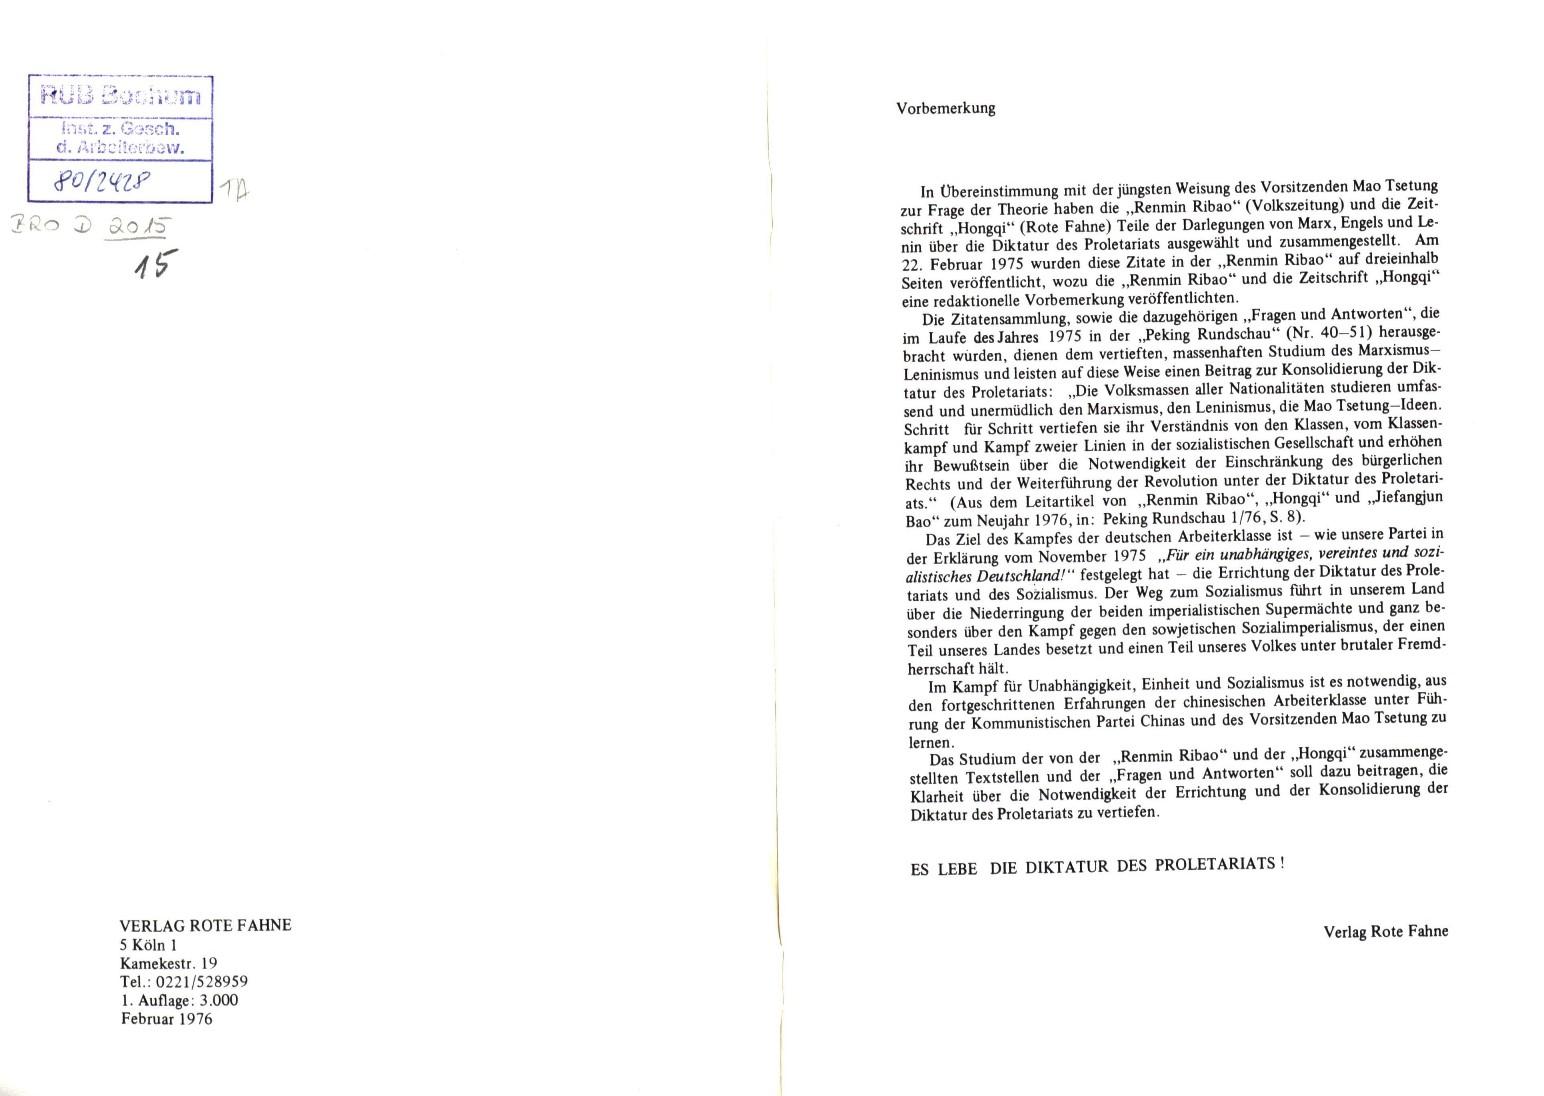 KPDAO_1976_Es_lebe_die_Diktatur_des_Proletariats_03